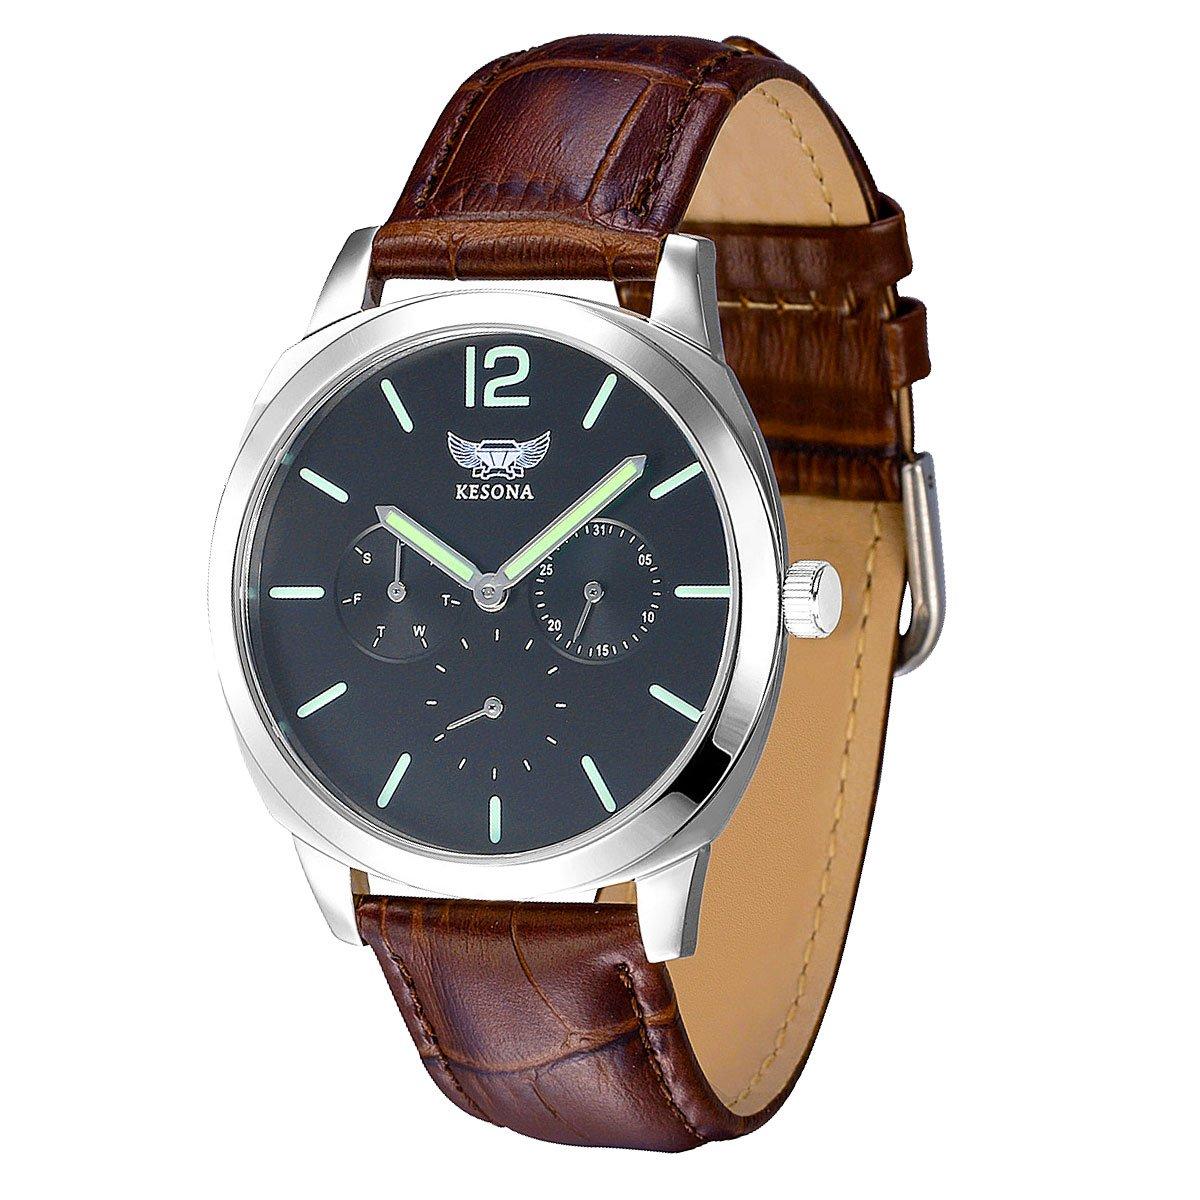 Men's Quartz Watch,KESONA Fashion Multifunction Luminous Waterproof Wrist Watch Sapphire Glass Business Casual Leather strap(Black) by KESONA